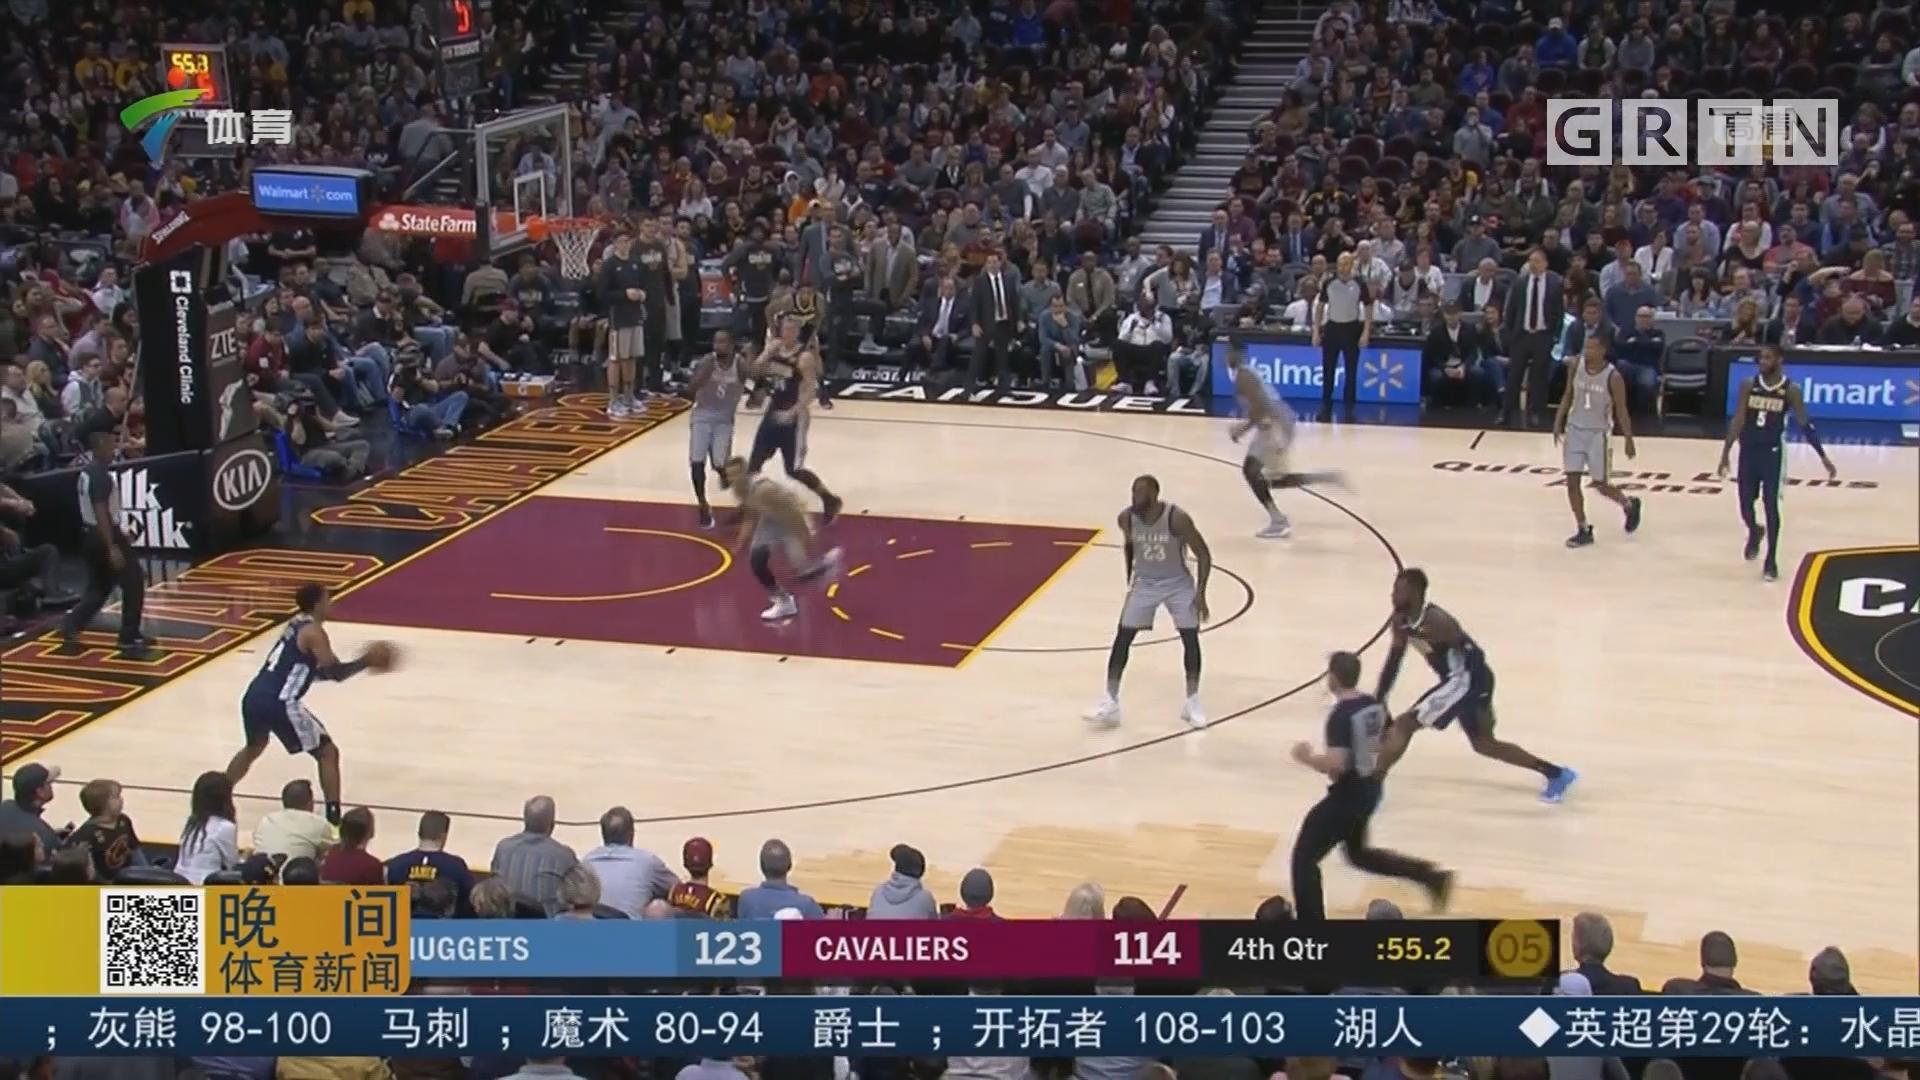 NBA实力榜:火箭居榜首 骑士再跌两位